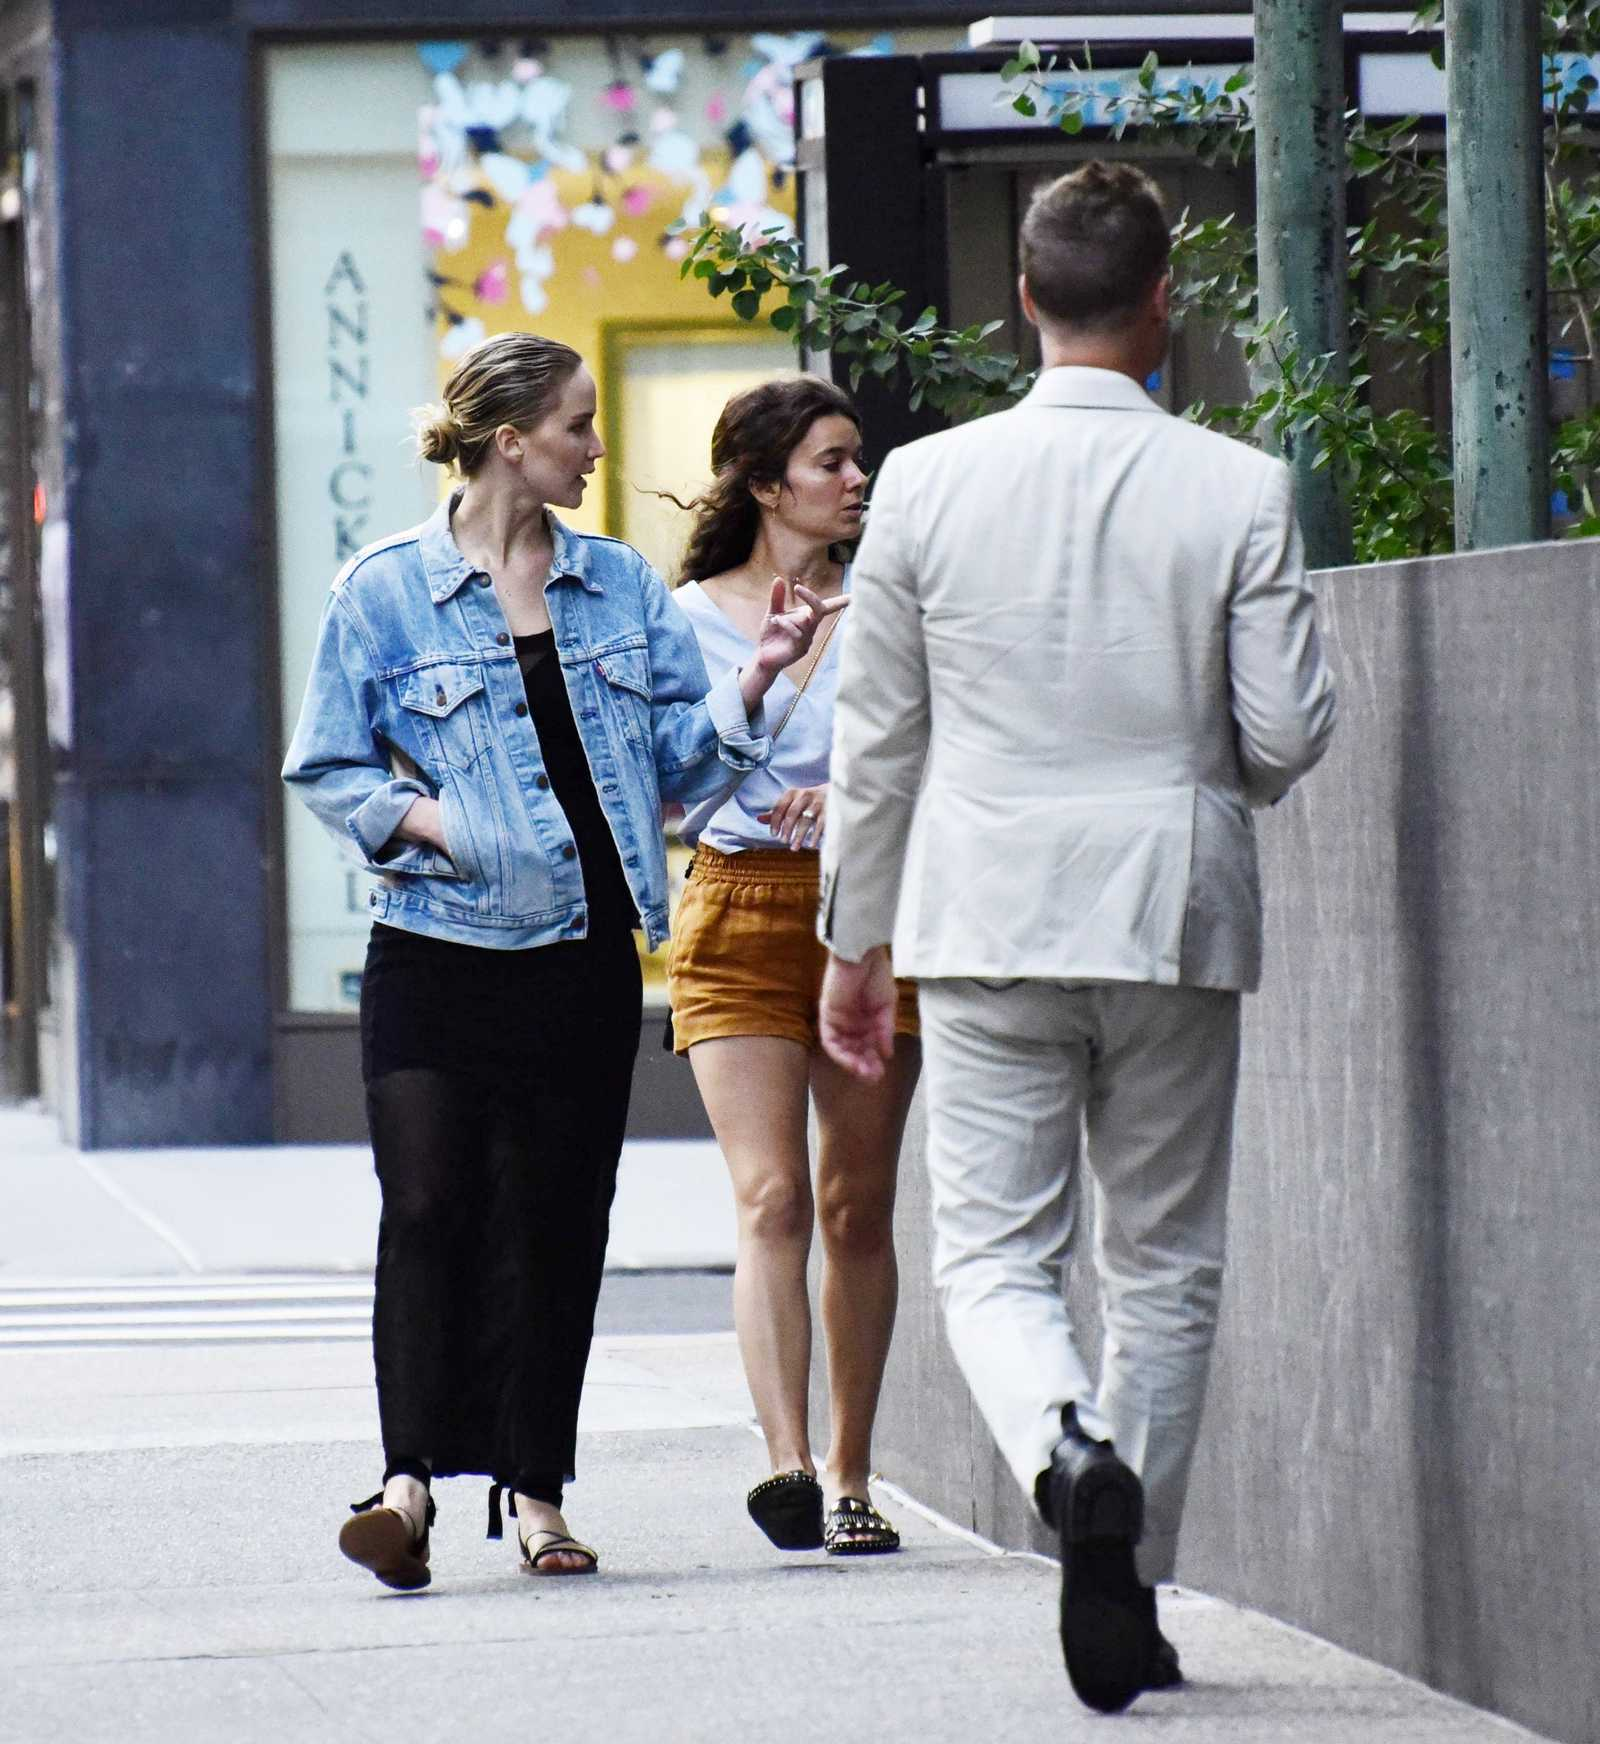 http://jenniferlawrencedaily.com/gallery/albums/userpics/10001/Jennifer_Lawrence_-_In_New_York_City_on_June_14-07.jpg